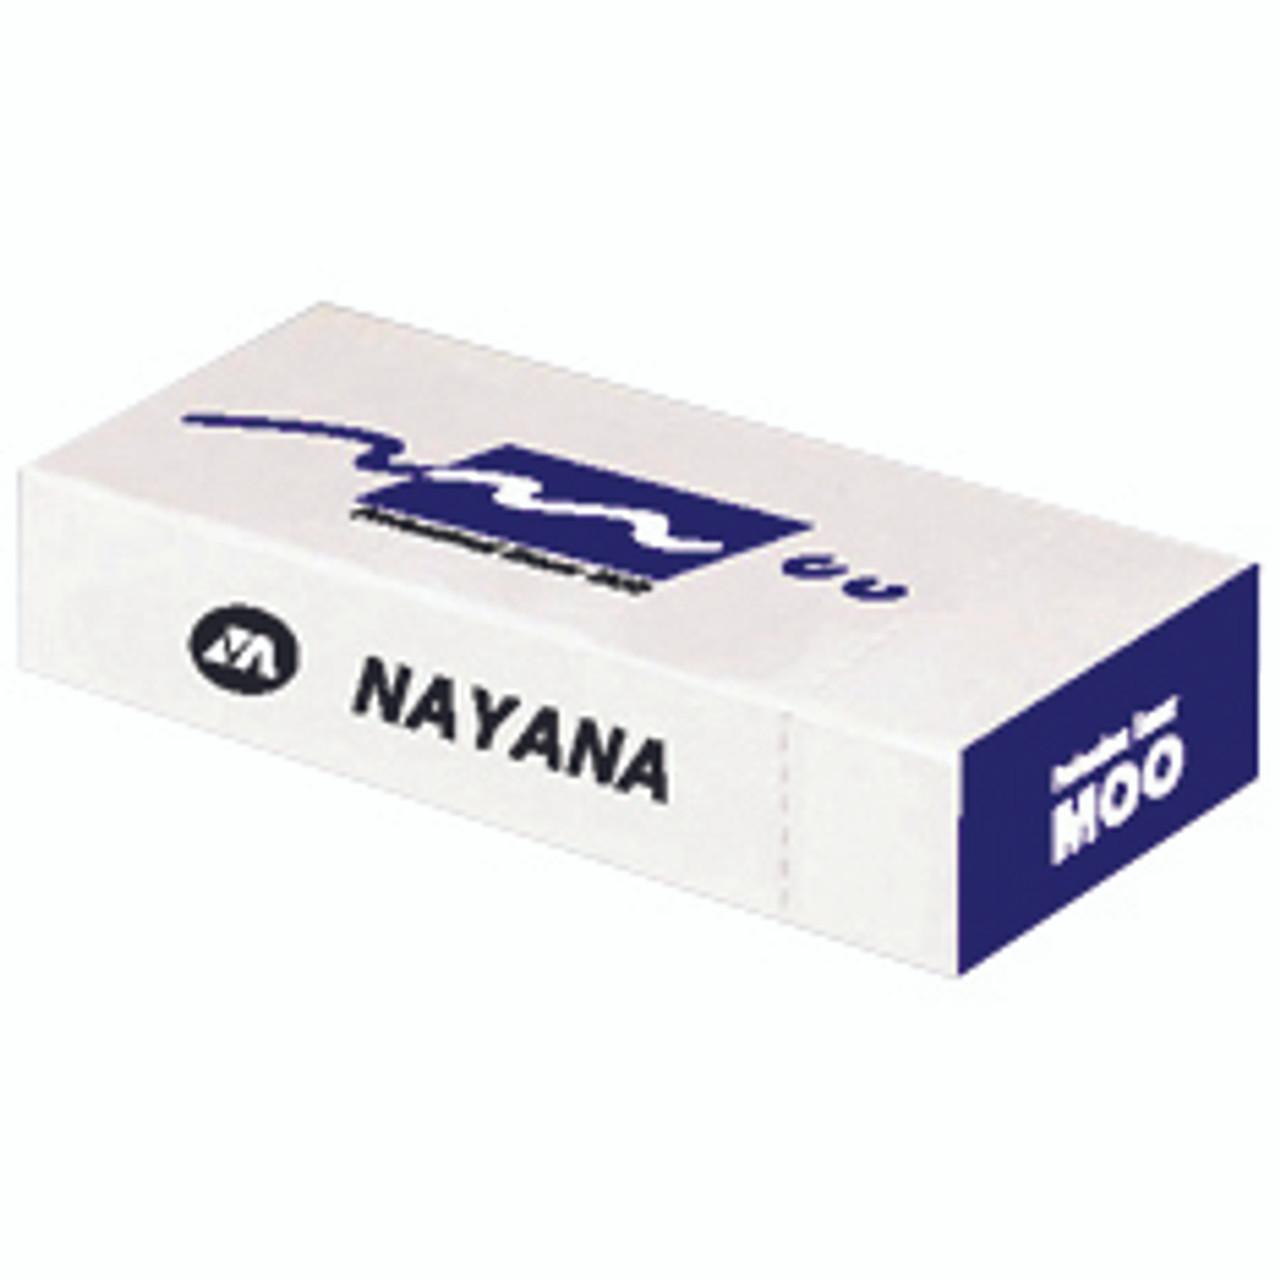 MOO Professional Artist Eraser